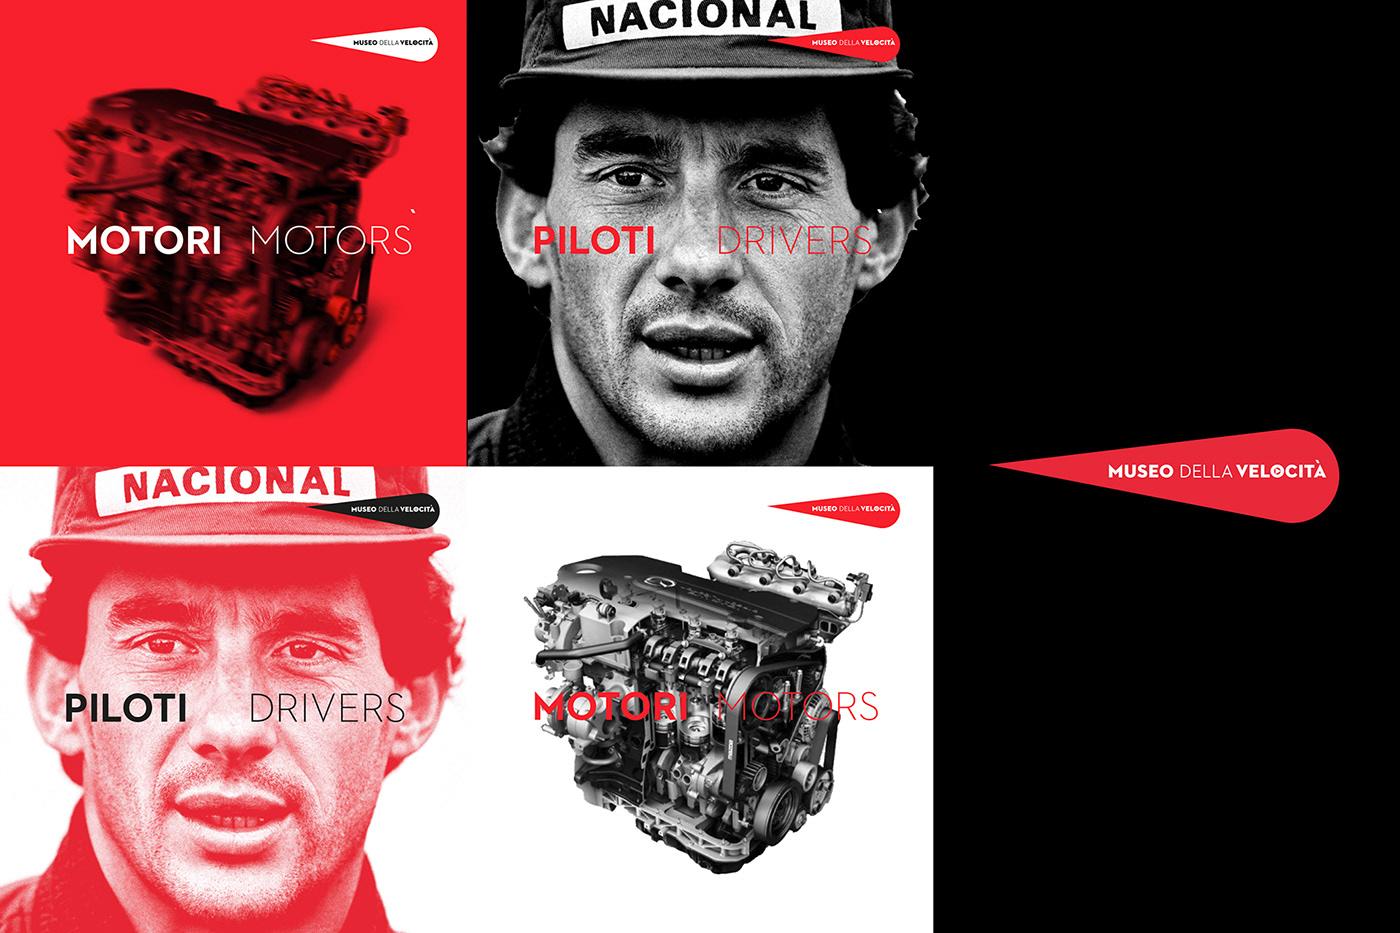 Autodromo speed Formula1 Exhibition  monza racetrack moto Brand Image museum identity